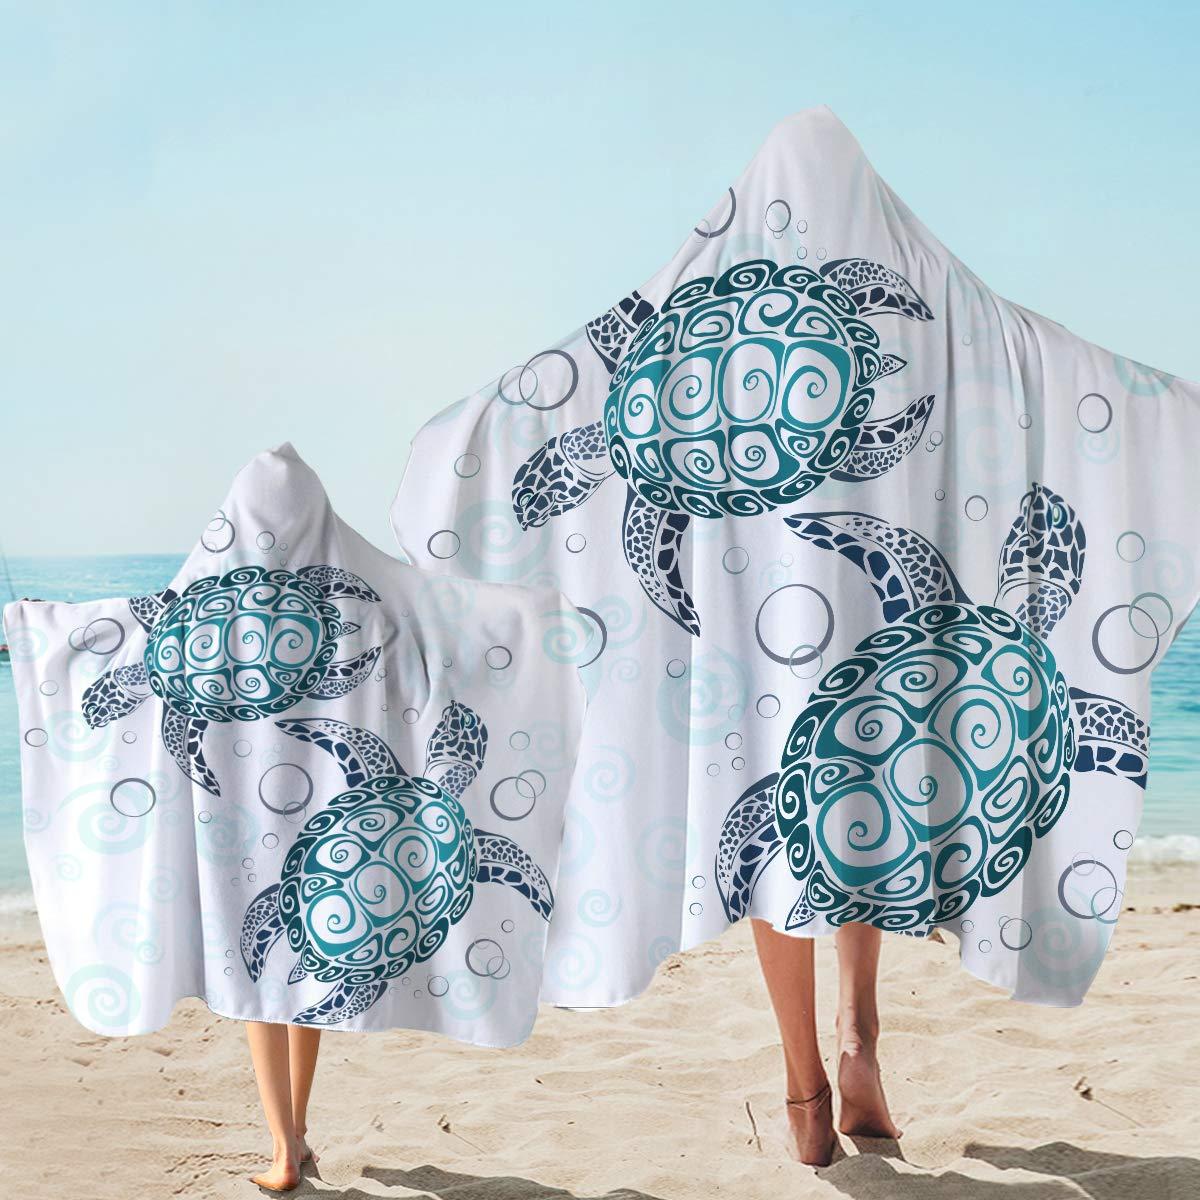 Sleepwish Turtle Hooded Bath Towel Turtle Beach Towel with Hood Beach Hoodie Towel Bathroom Wearable Towels (White and Turquoise,Kids and Adults)